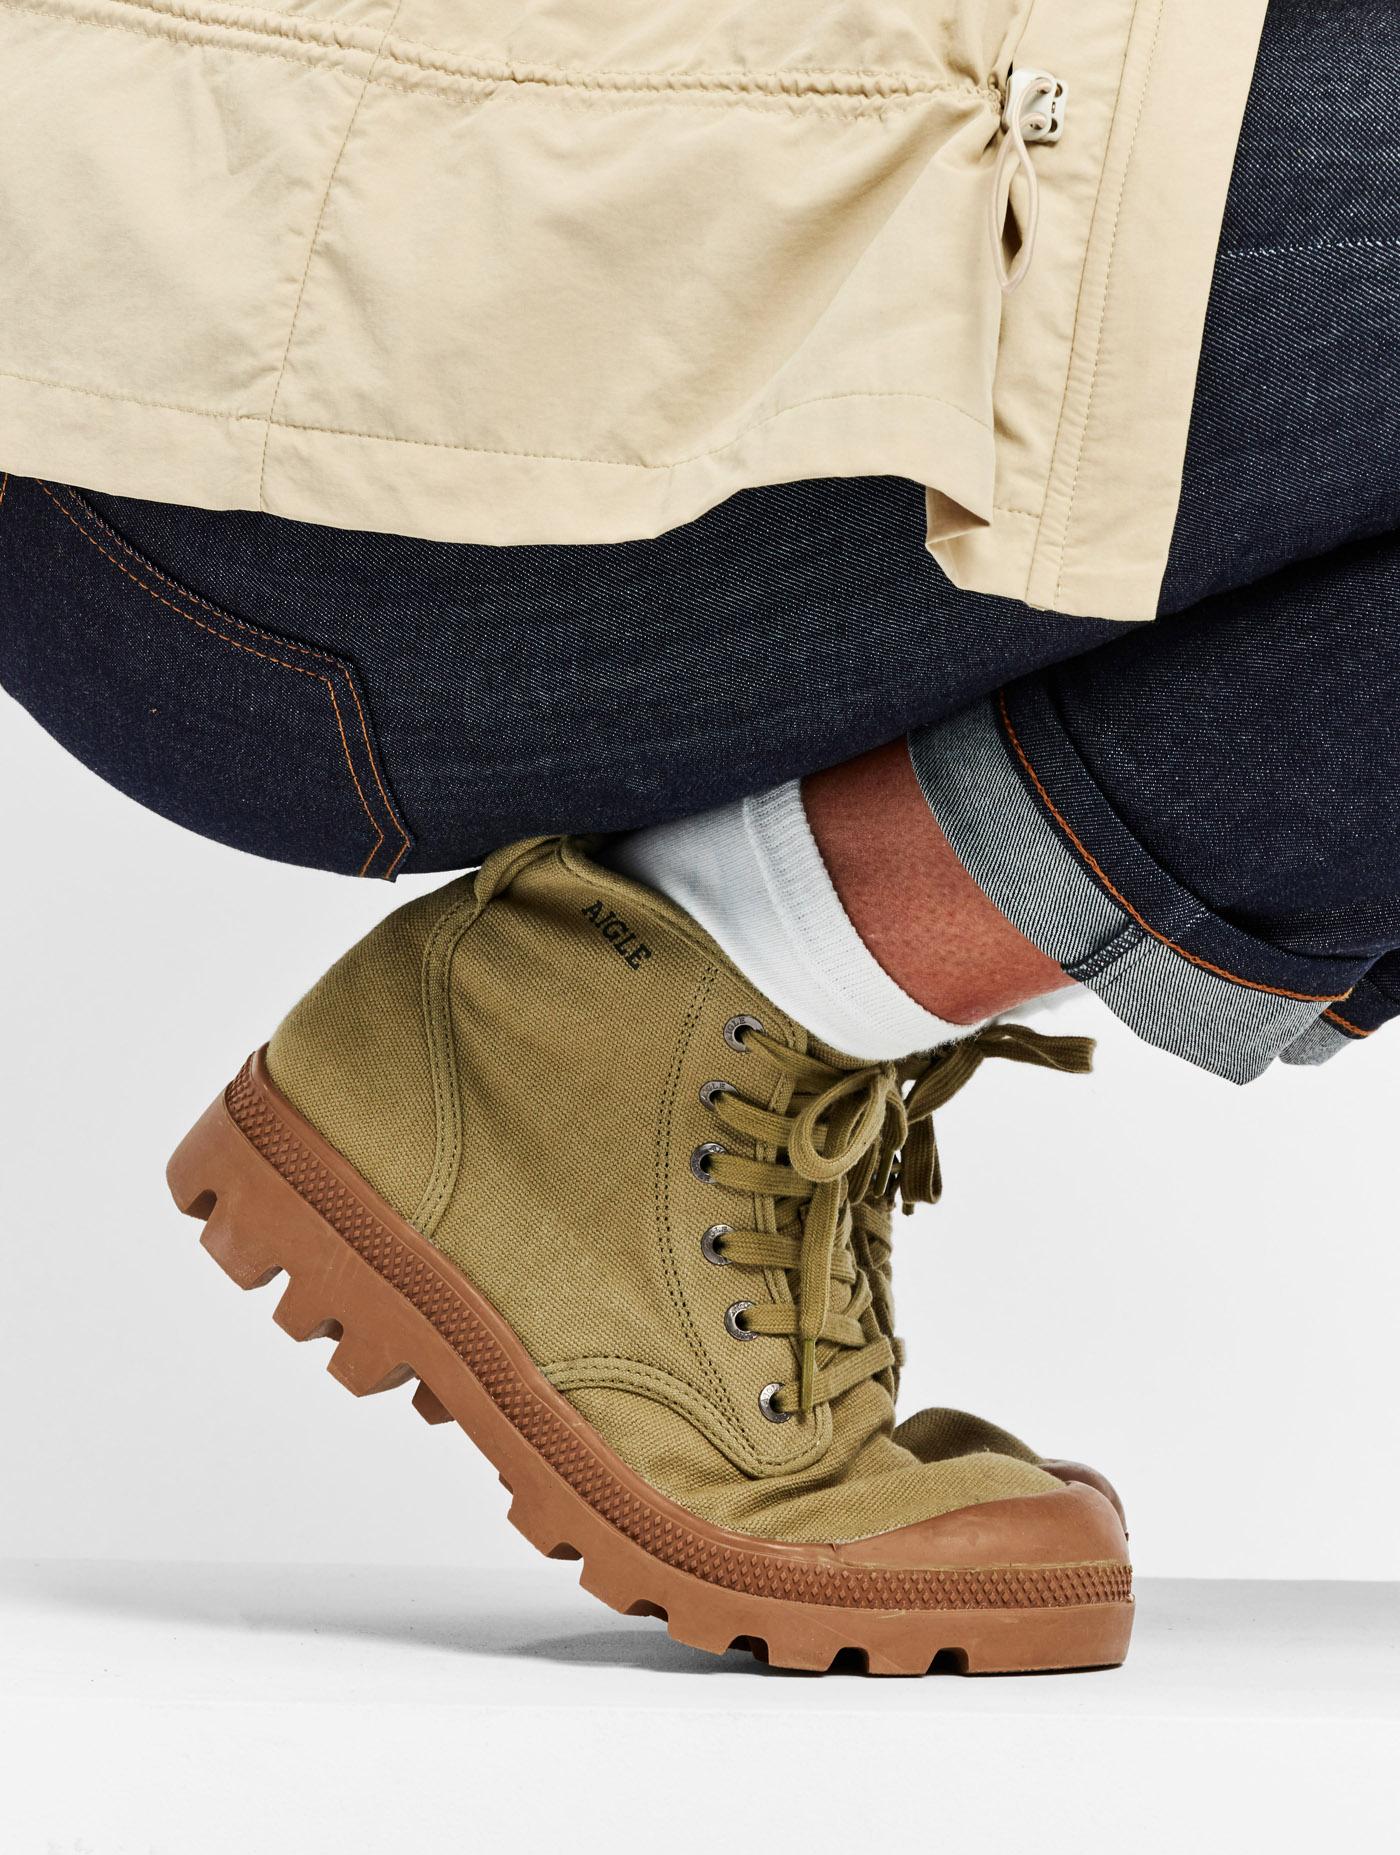 femme cherche chaussure